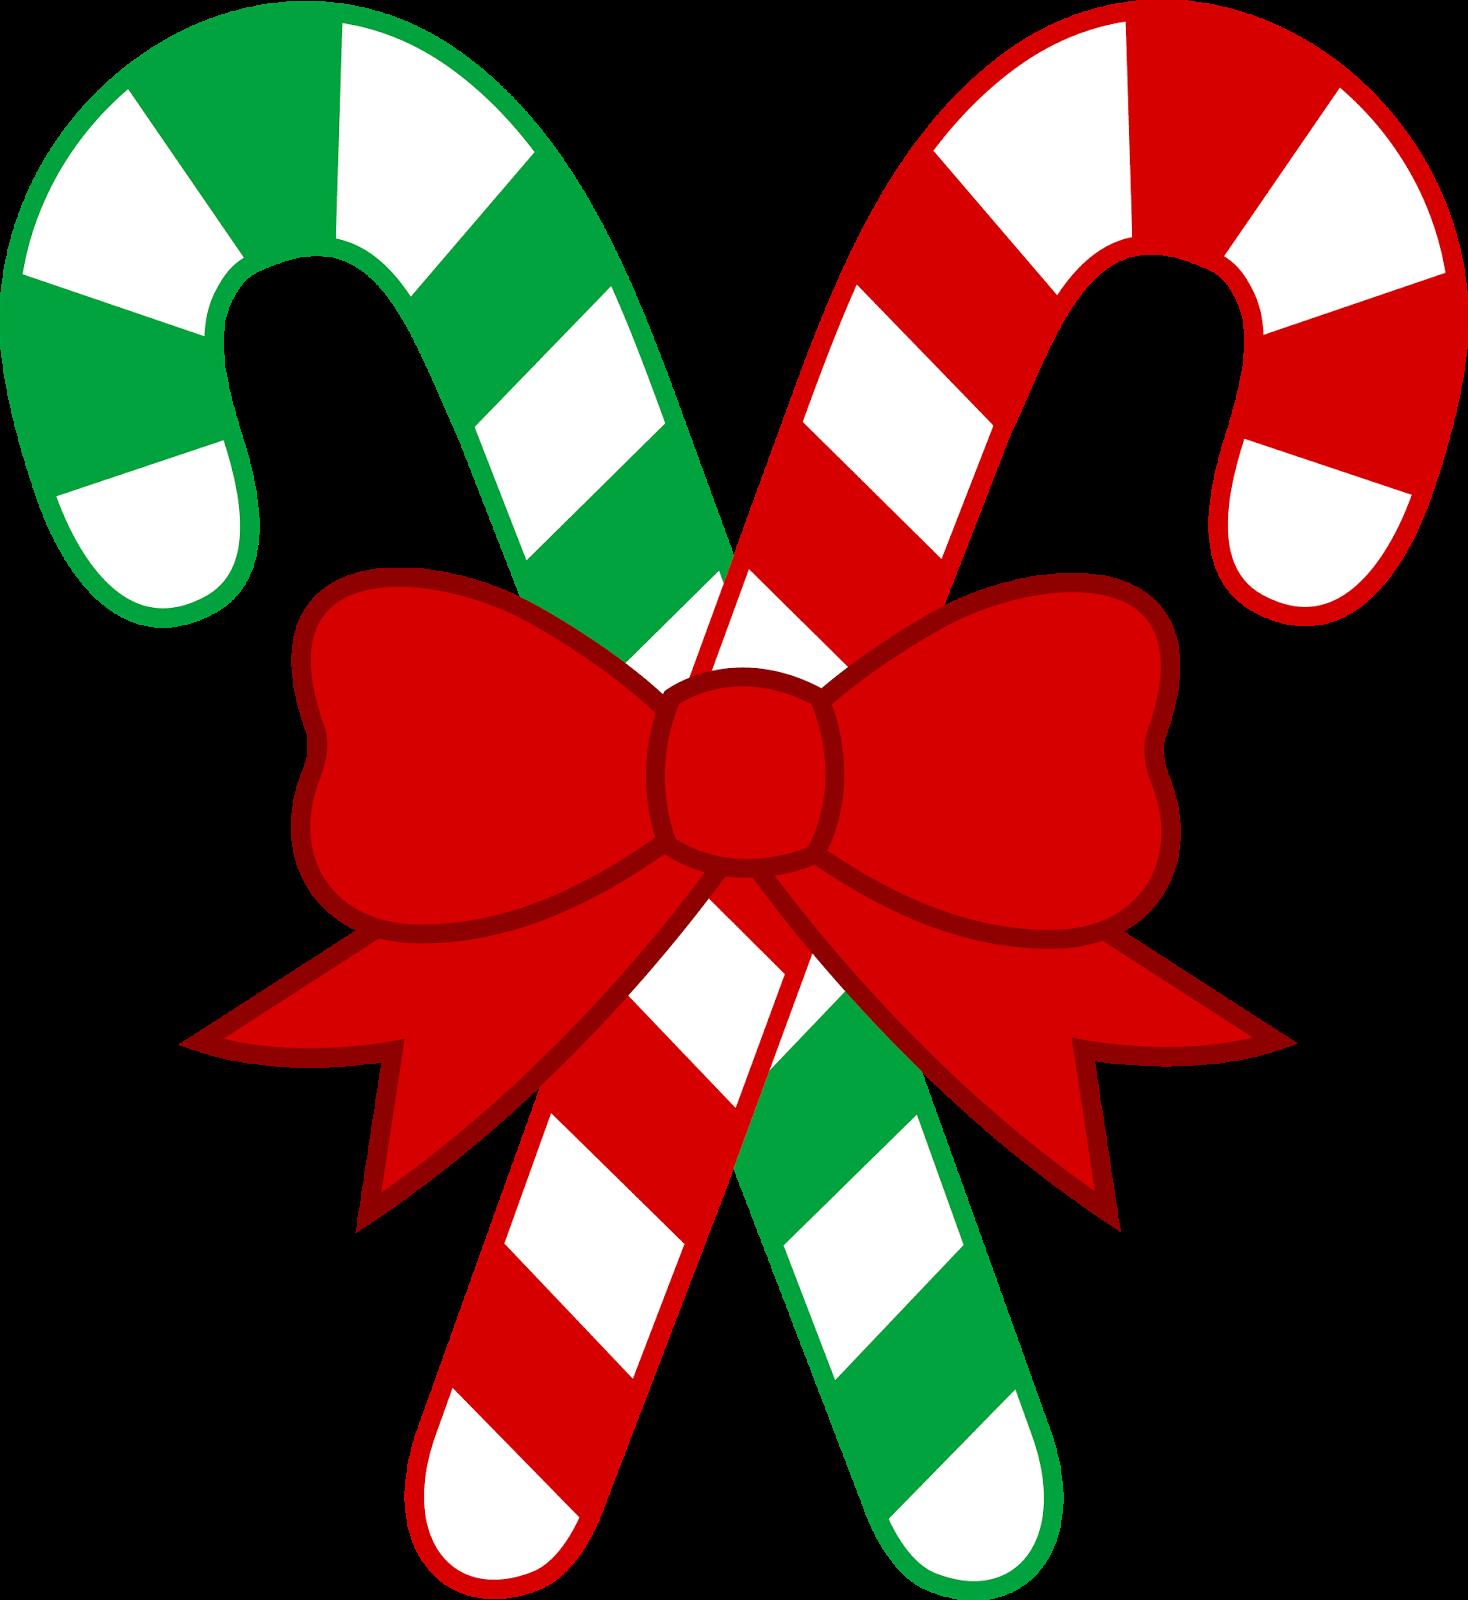 banner stock Free clip art images. December clipart.